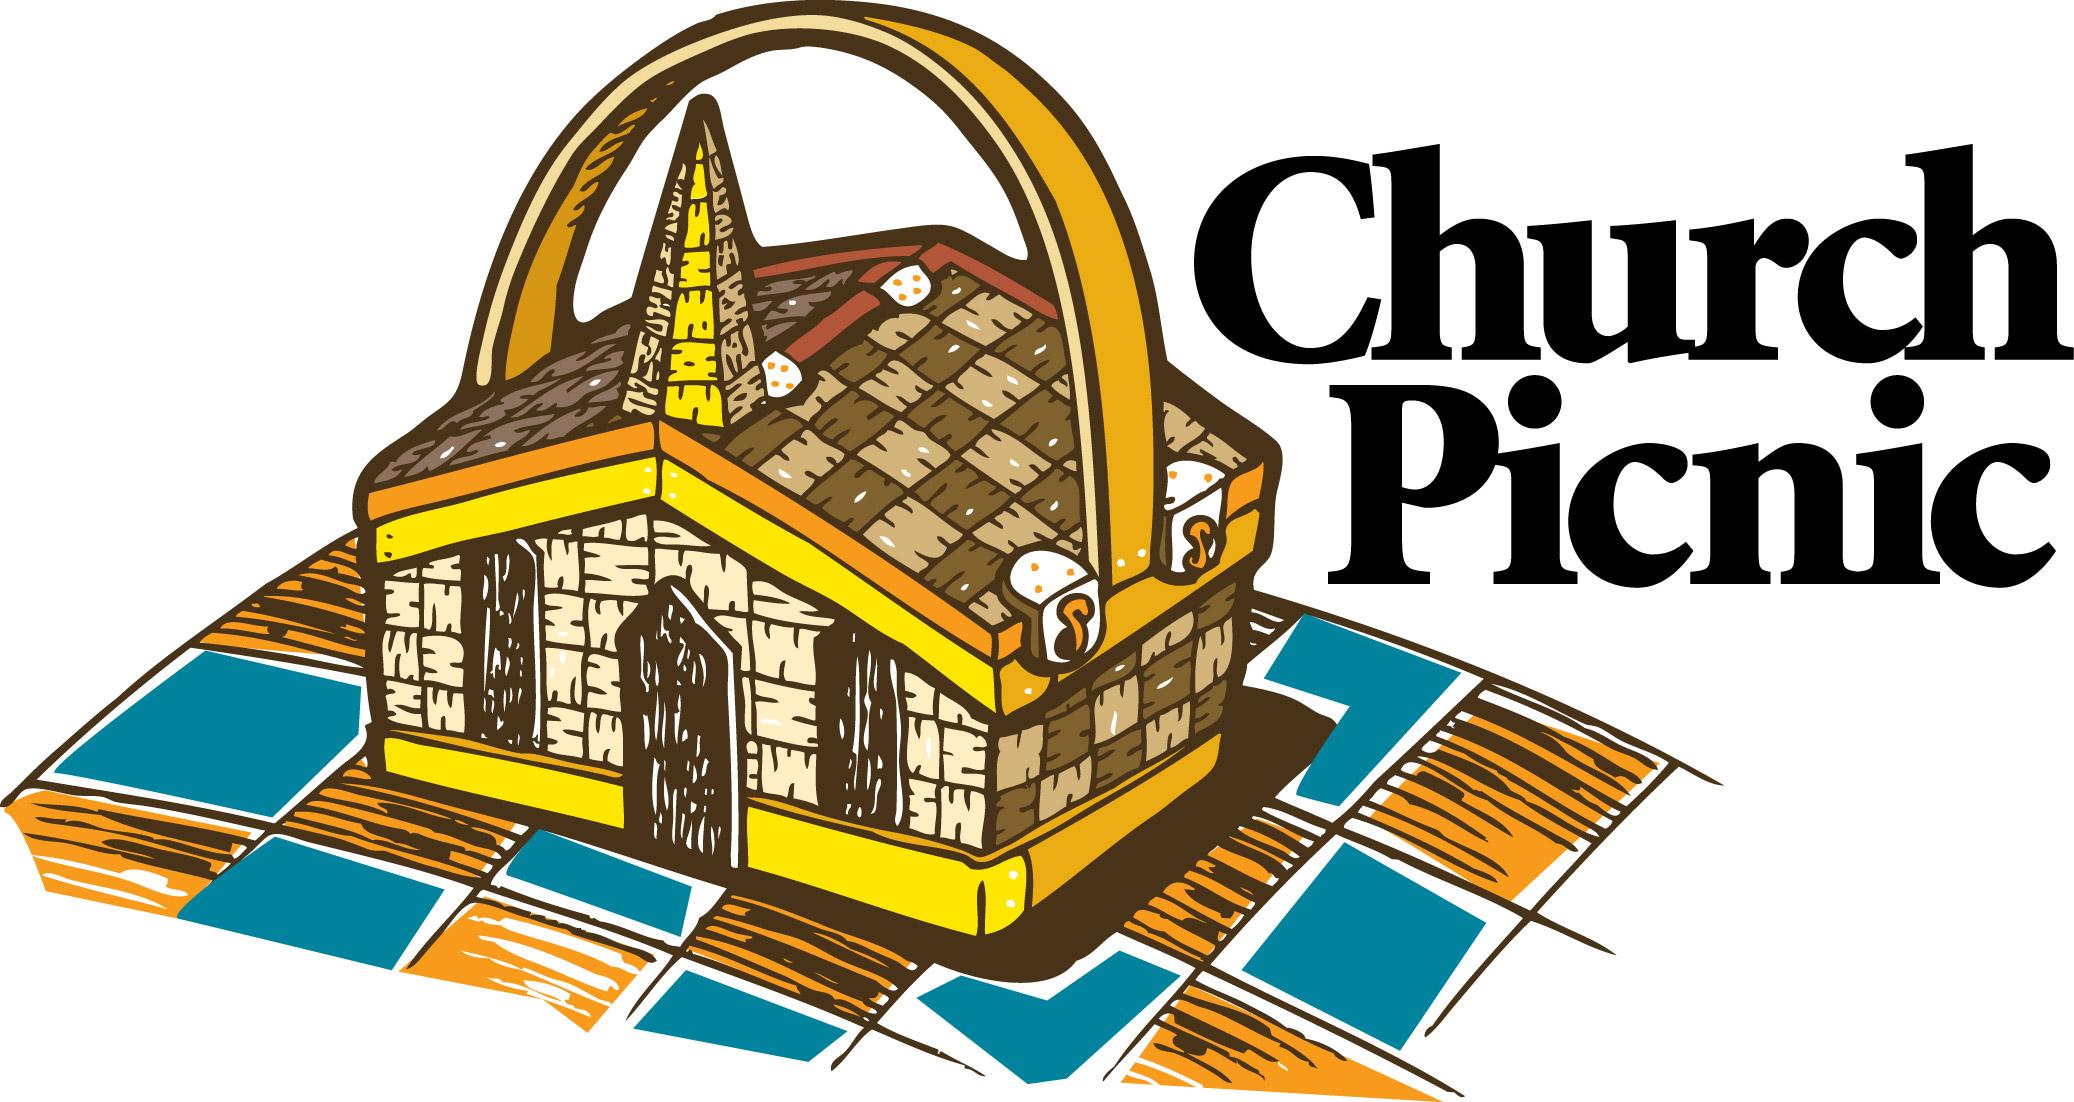 Picnic clipart church picnic Church Images Free Art Clipart